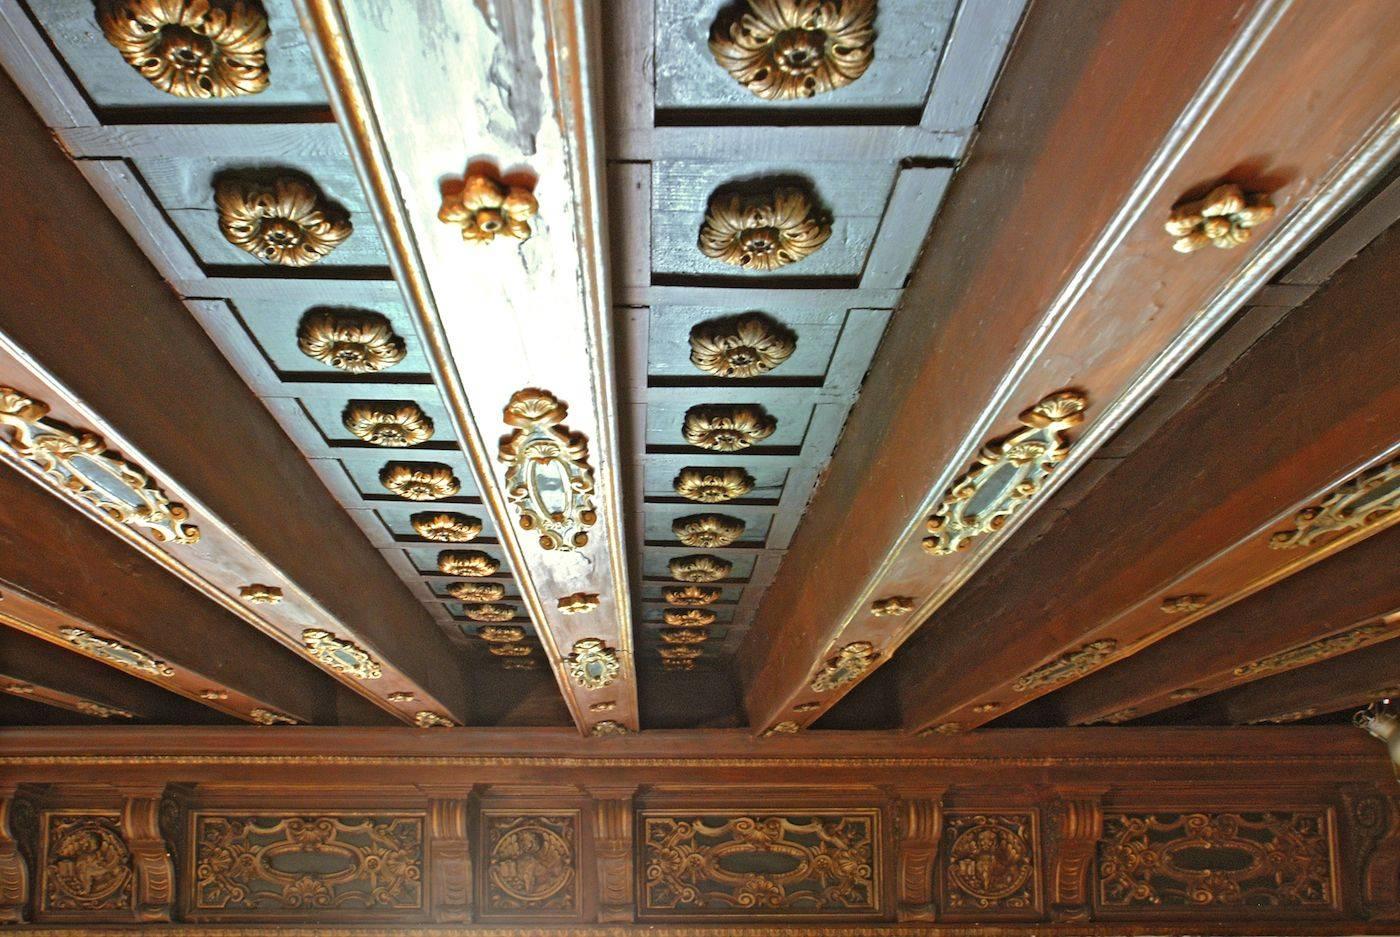 the impressive authentic XVII century wooden ceiling